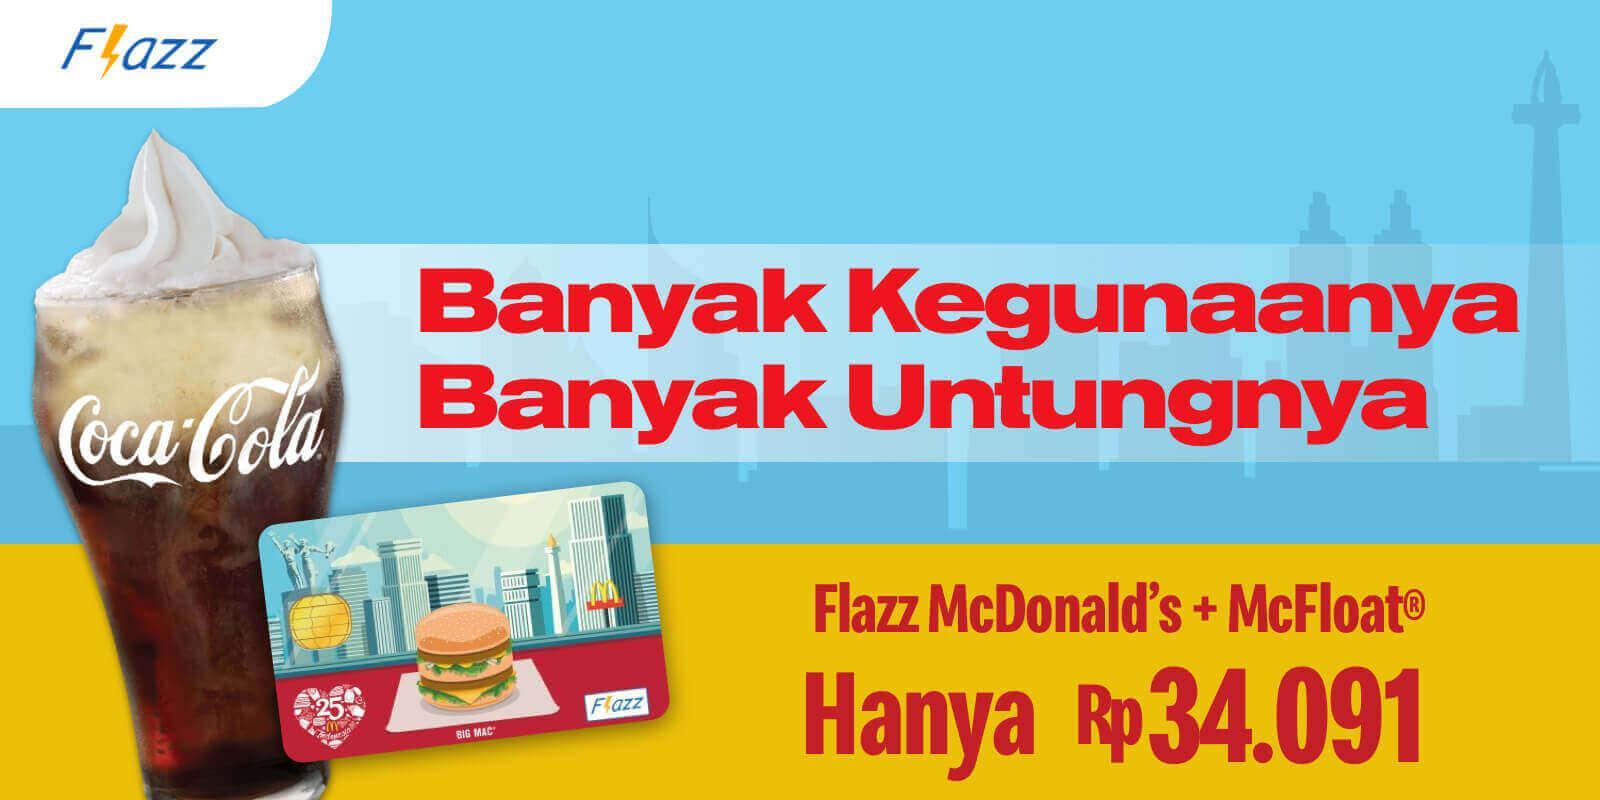 McDonalds Promo Serba Untung Serba Hemat Dengan Flazz McDonalds, Ini Dia Promonya!